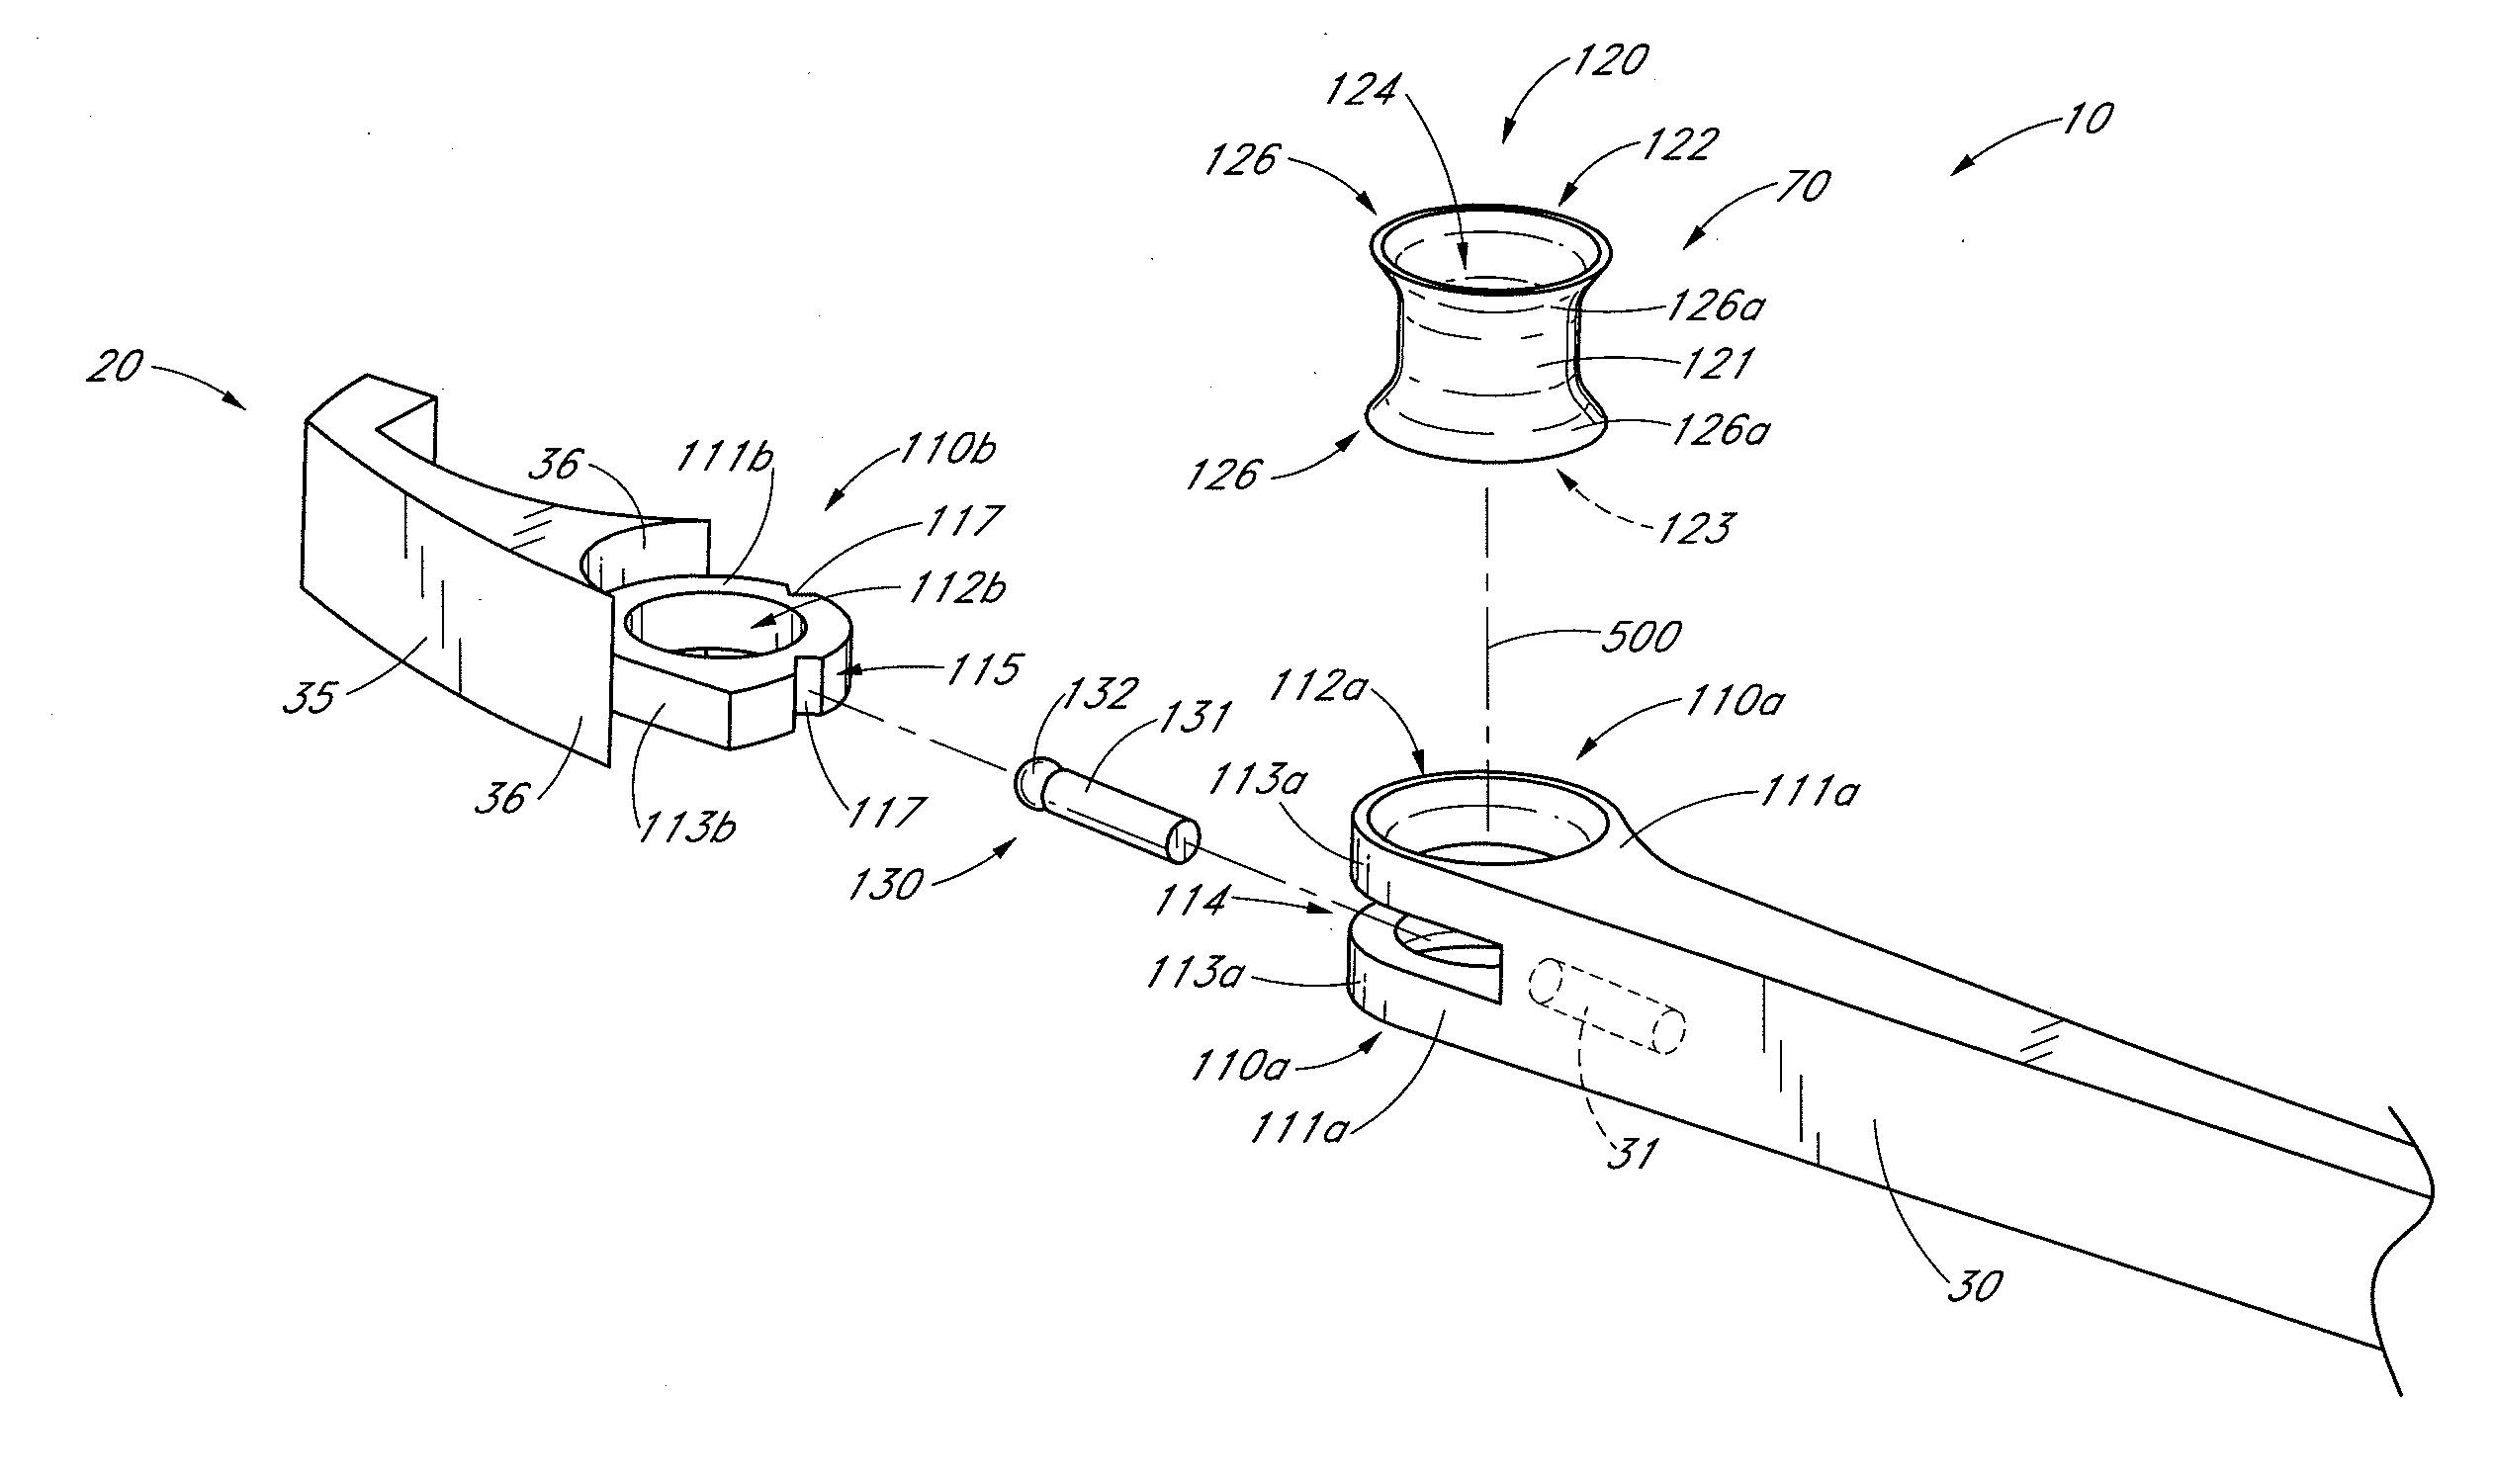 Eyeglass Frame Parts Diagram : Patent US20130000077 - Hinge assembly for eyewear - Google ...